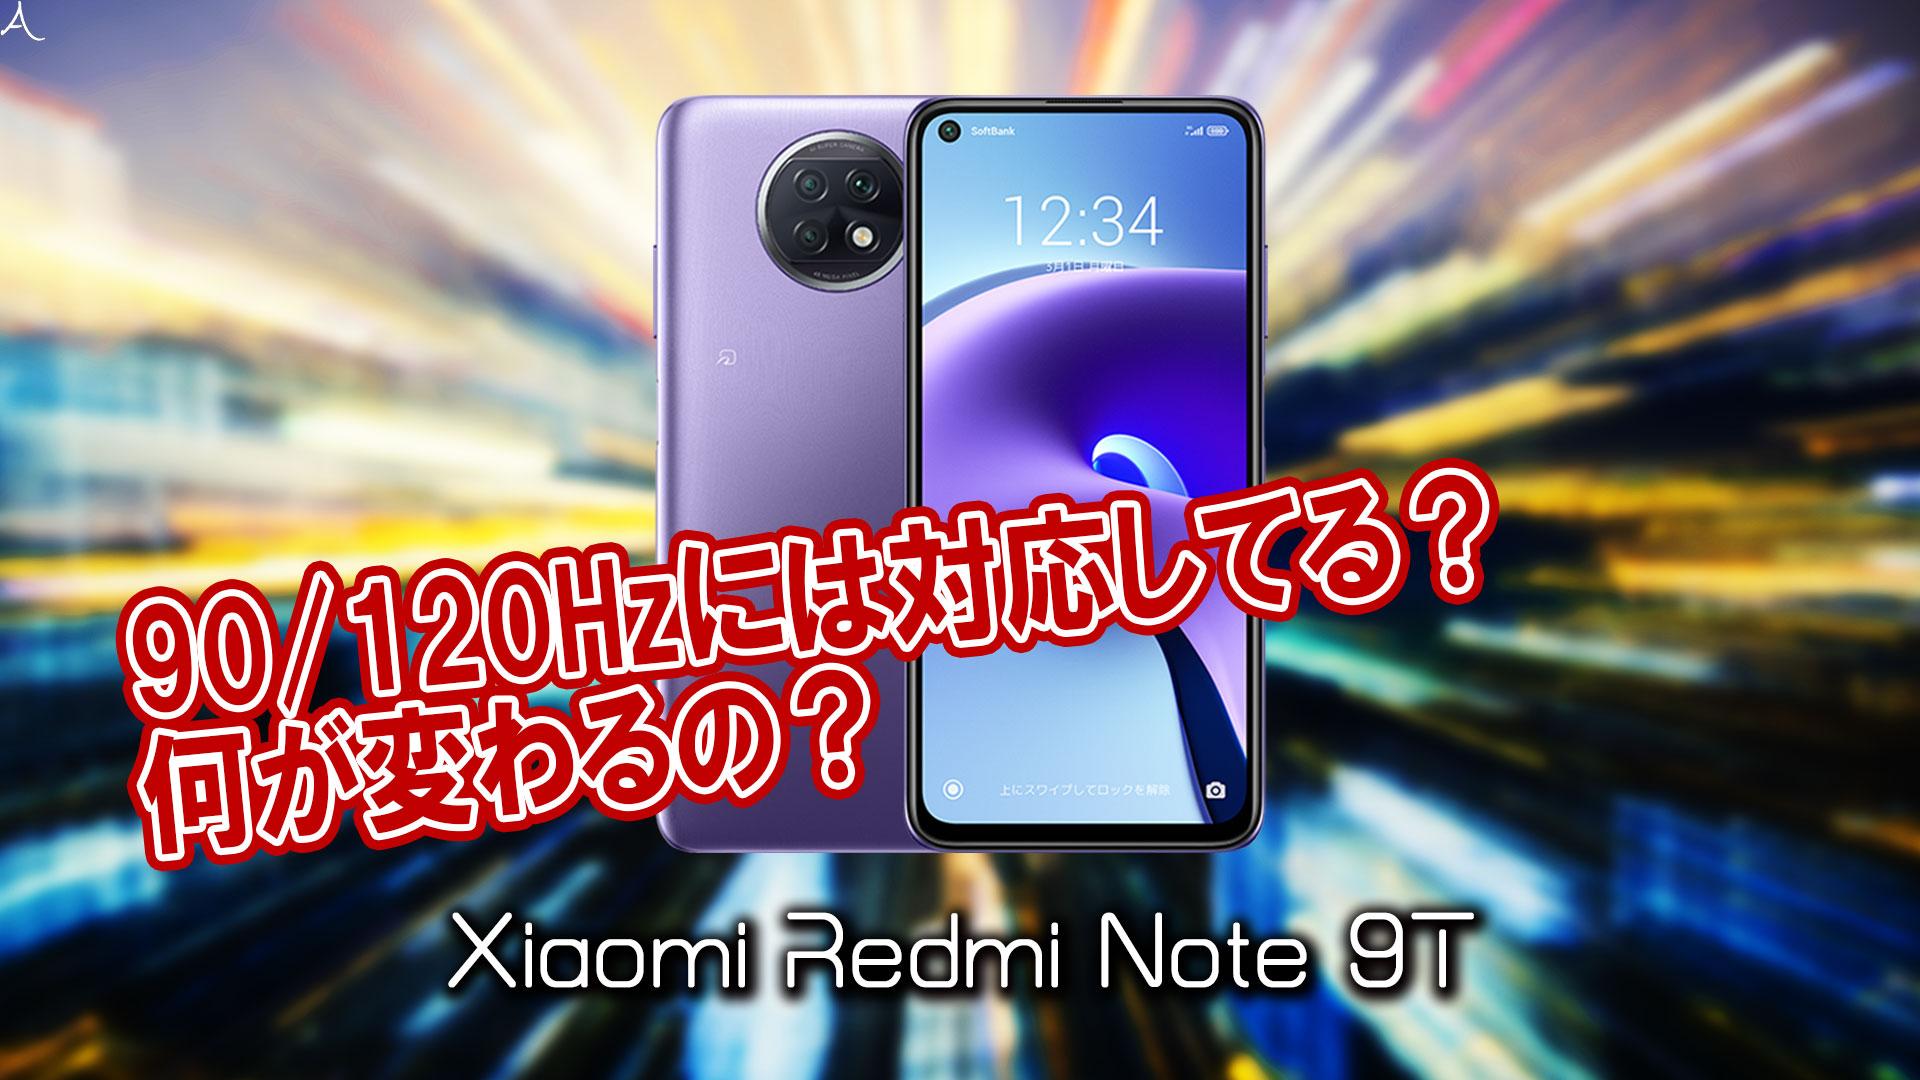 「Xiaomi Redmi Note 9T」のリフレッシュレートはいくつ?120Hzには対応してる?